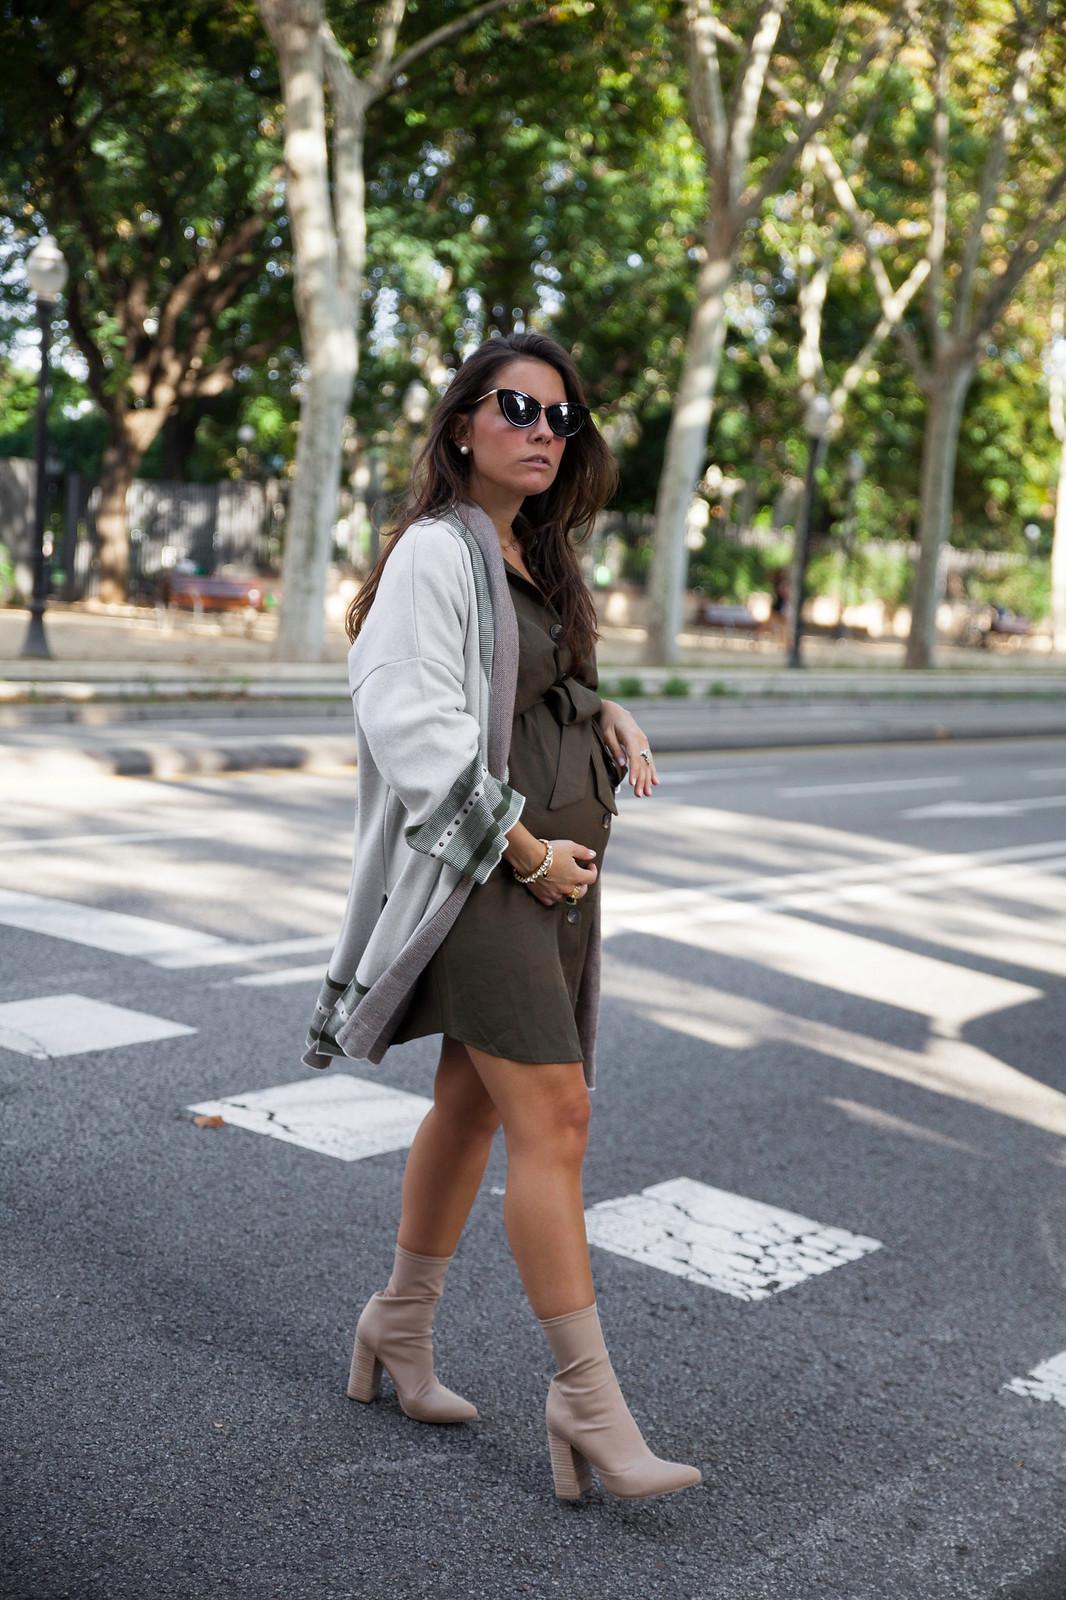 02_Como_combinar_un_cardigan_khaki_etnico_otoño_theguestgirl_rüga_laura_santolaira_influencer_embarazada_fashion_street_style_barcelona